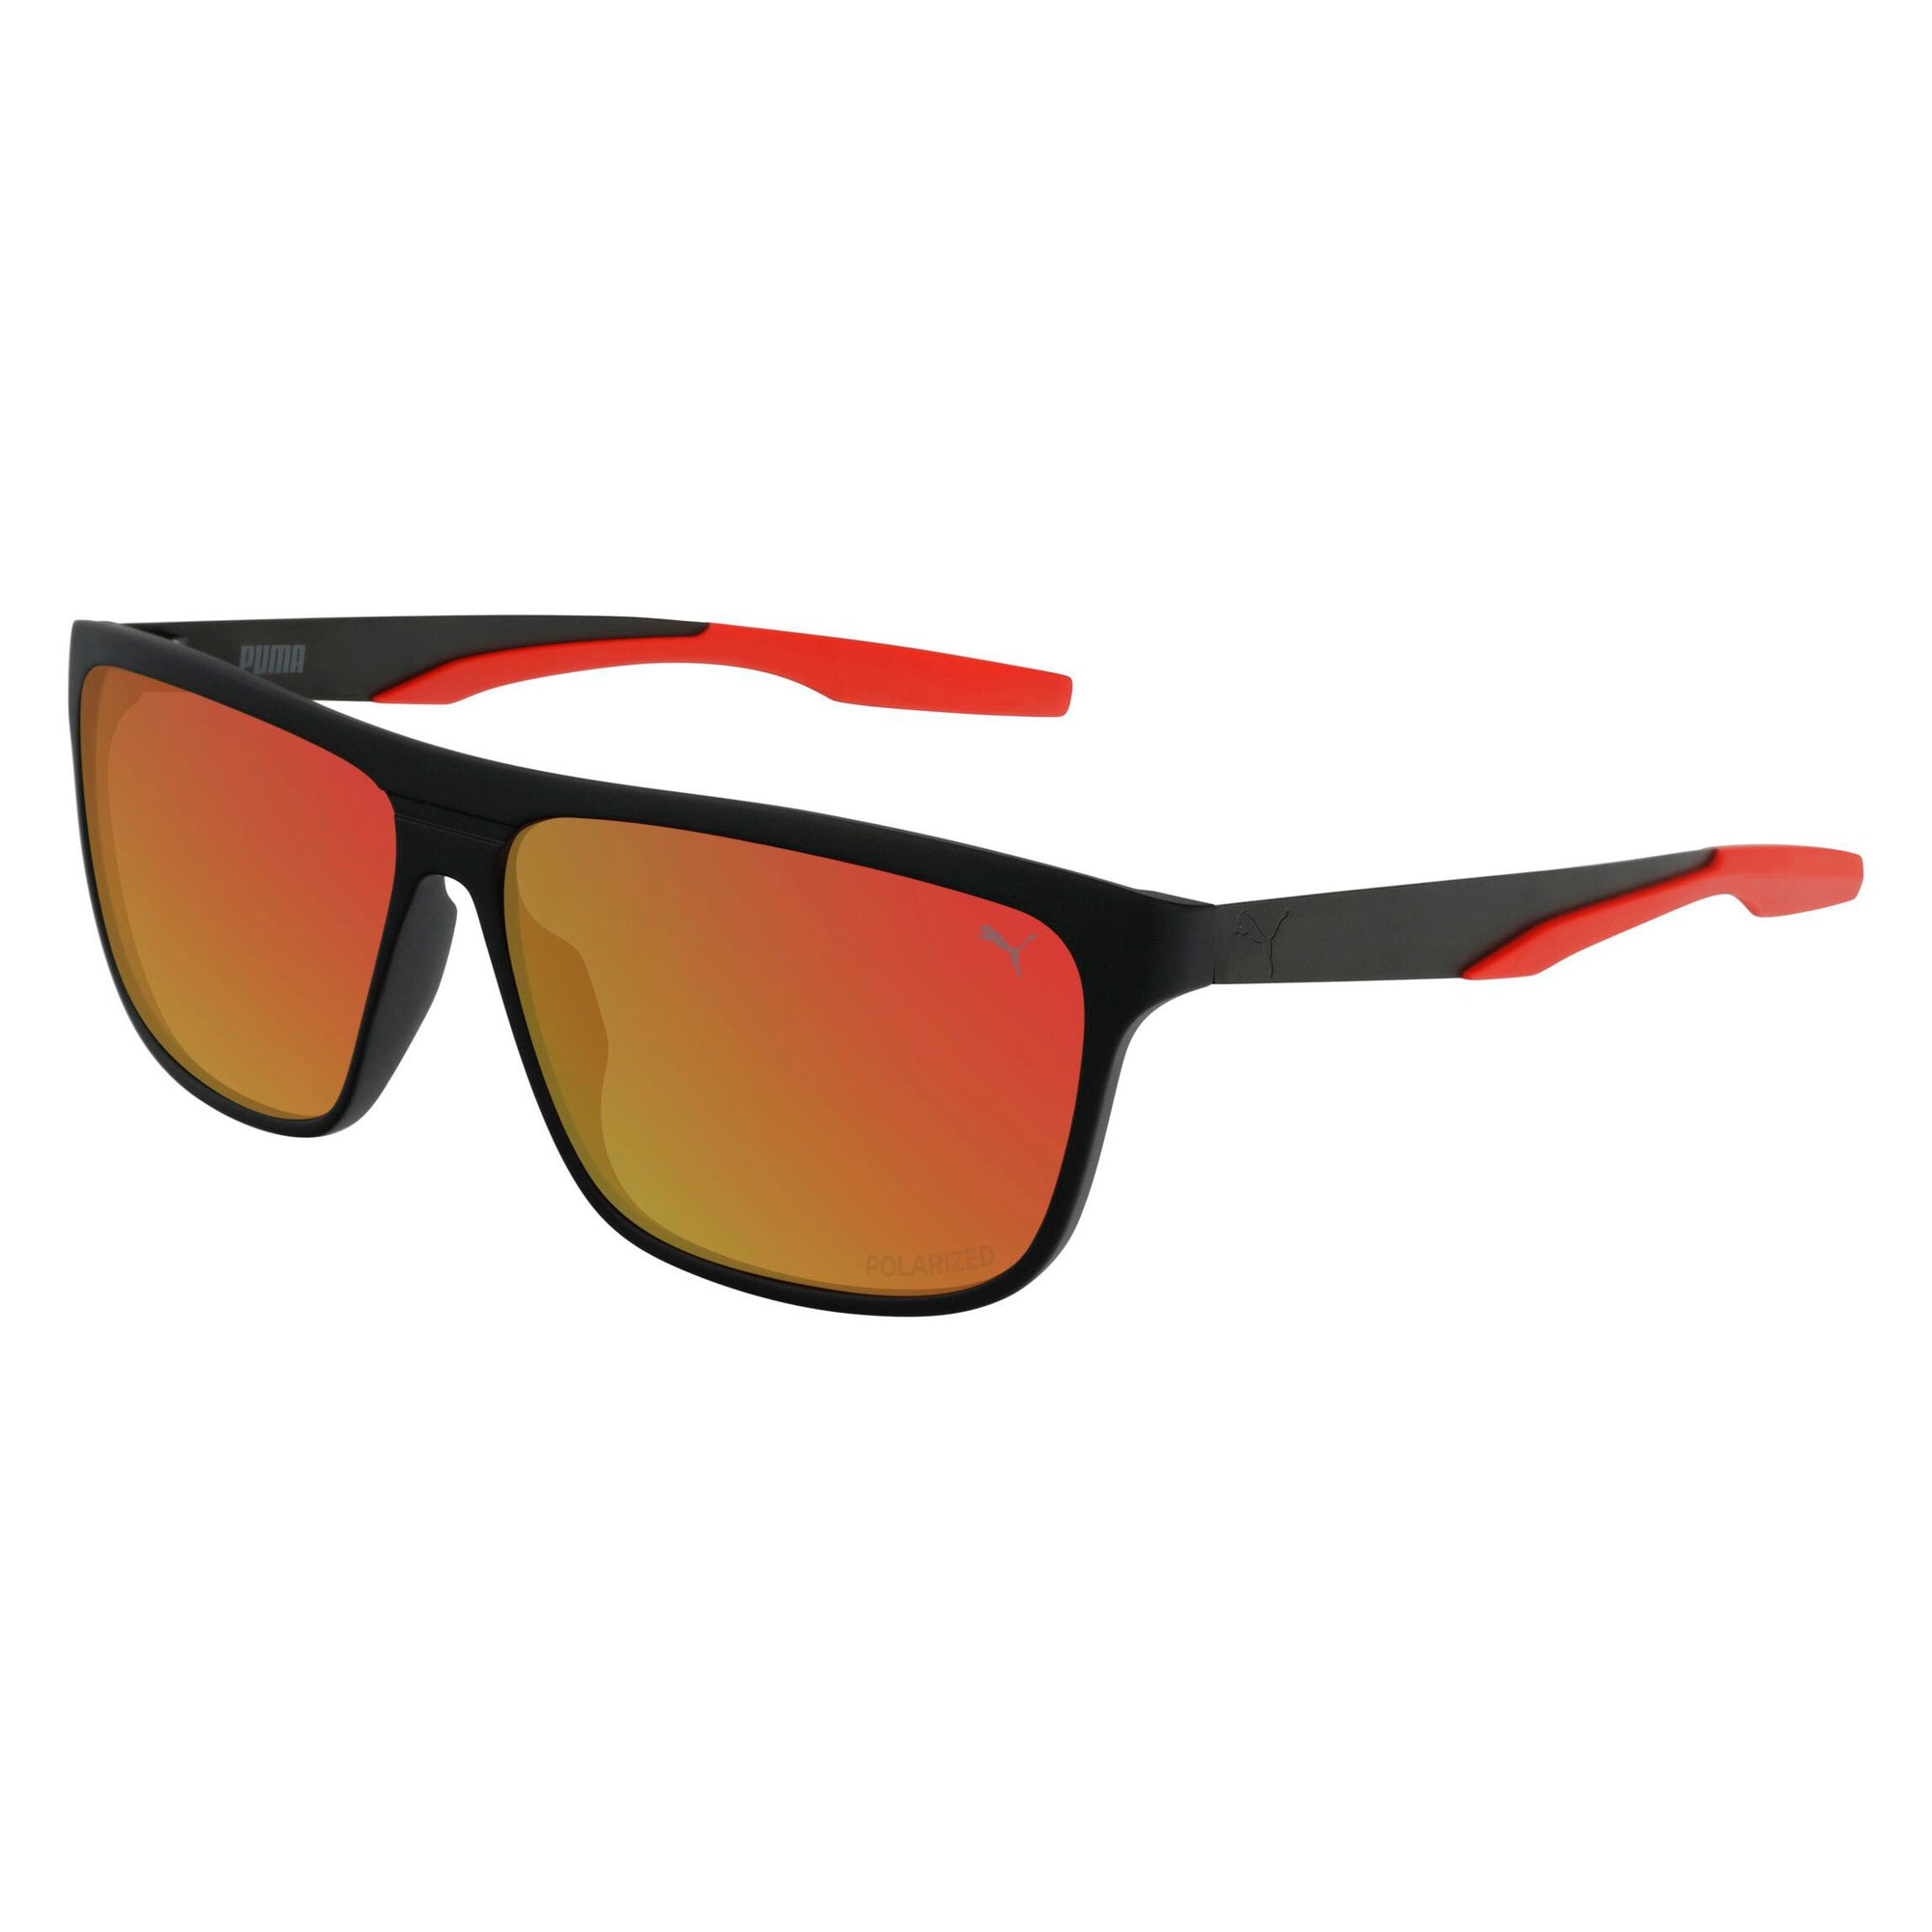 Thumbnail 1 of Laguna Sunglasses, BLACK-BLACK-RED, medium